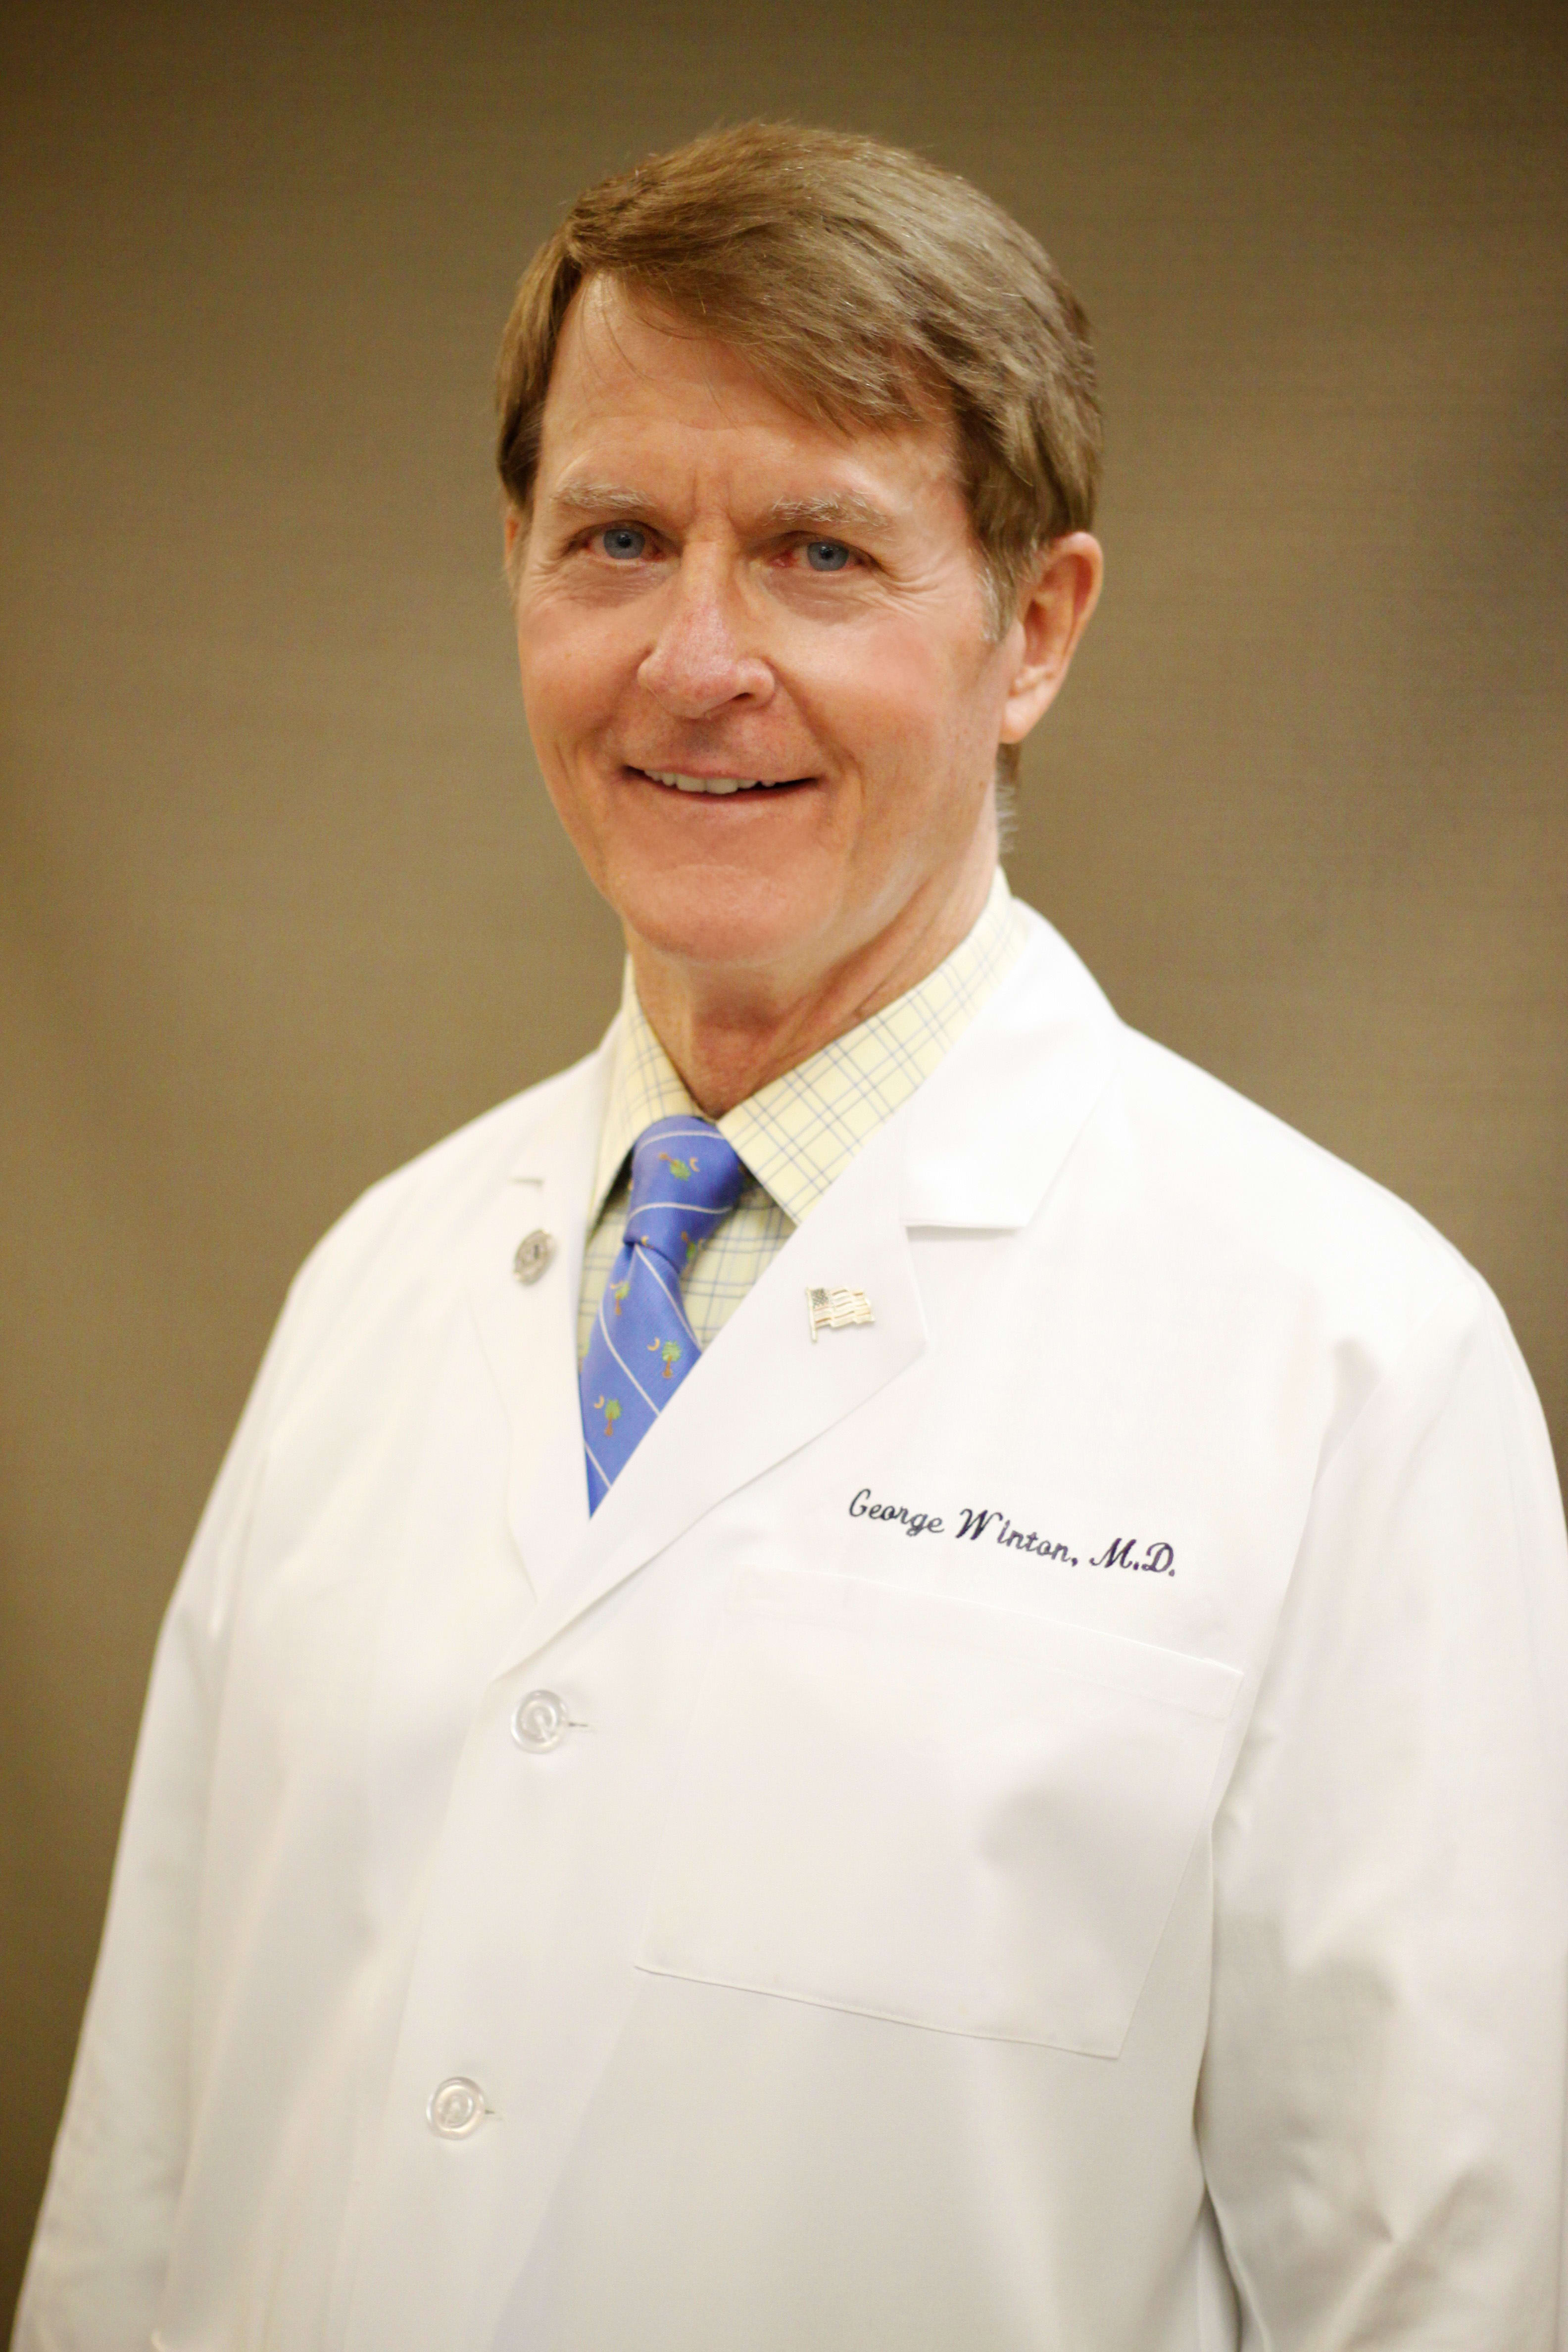 Dr. George B Winton MD